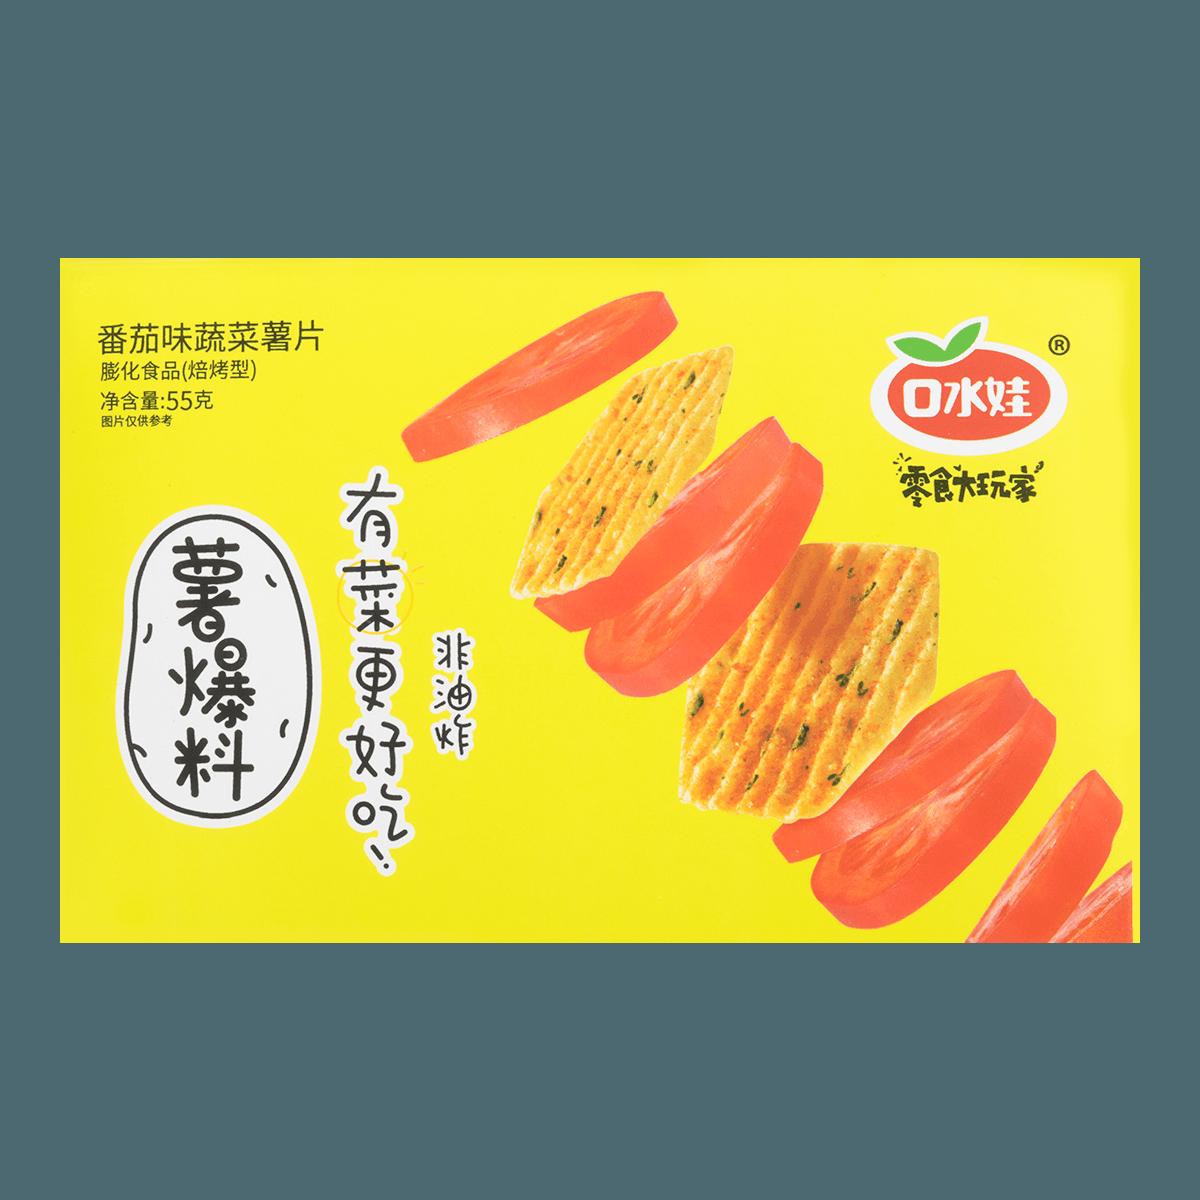 KOUSHUIWA Vegetable Potato Chips Tomato Flavor 55g